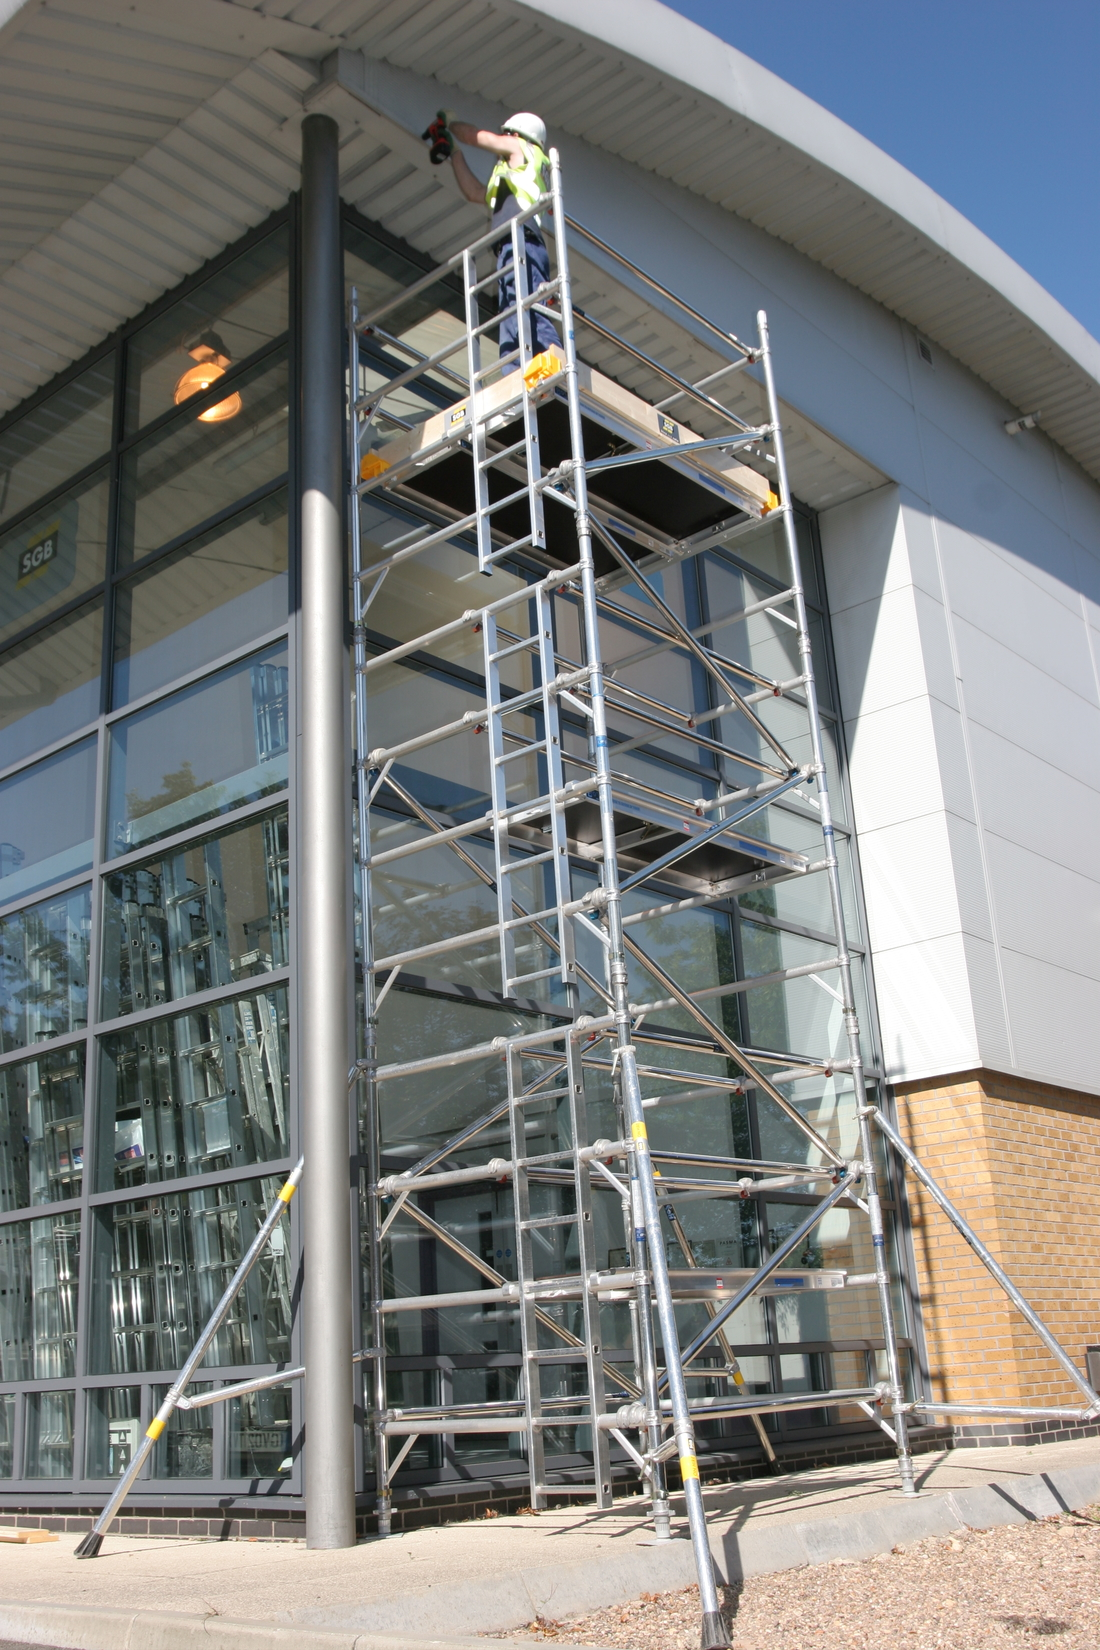 2.5m x 1.5m Base (Double Span) Scaffold Tower Maximum Platform Height 6.2m